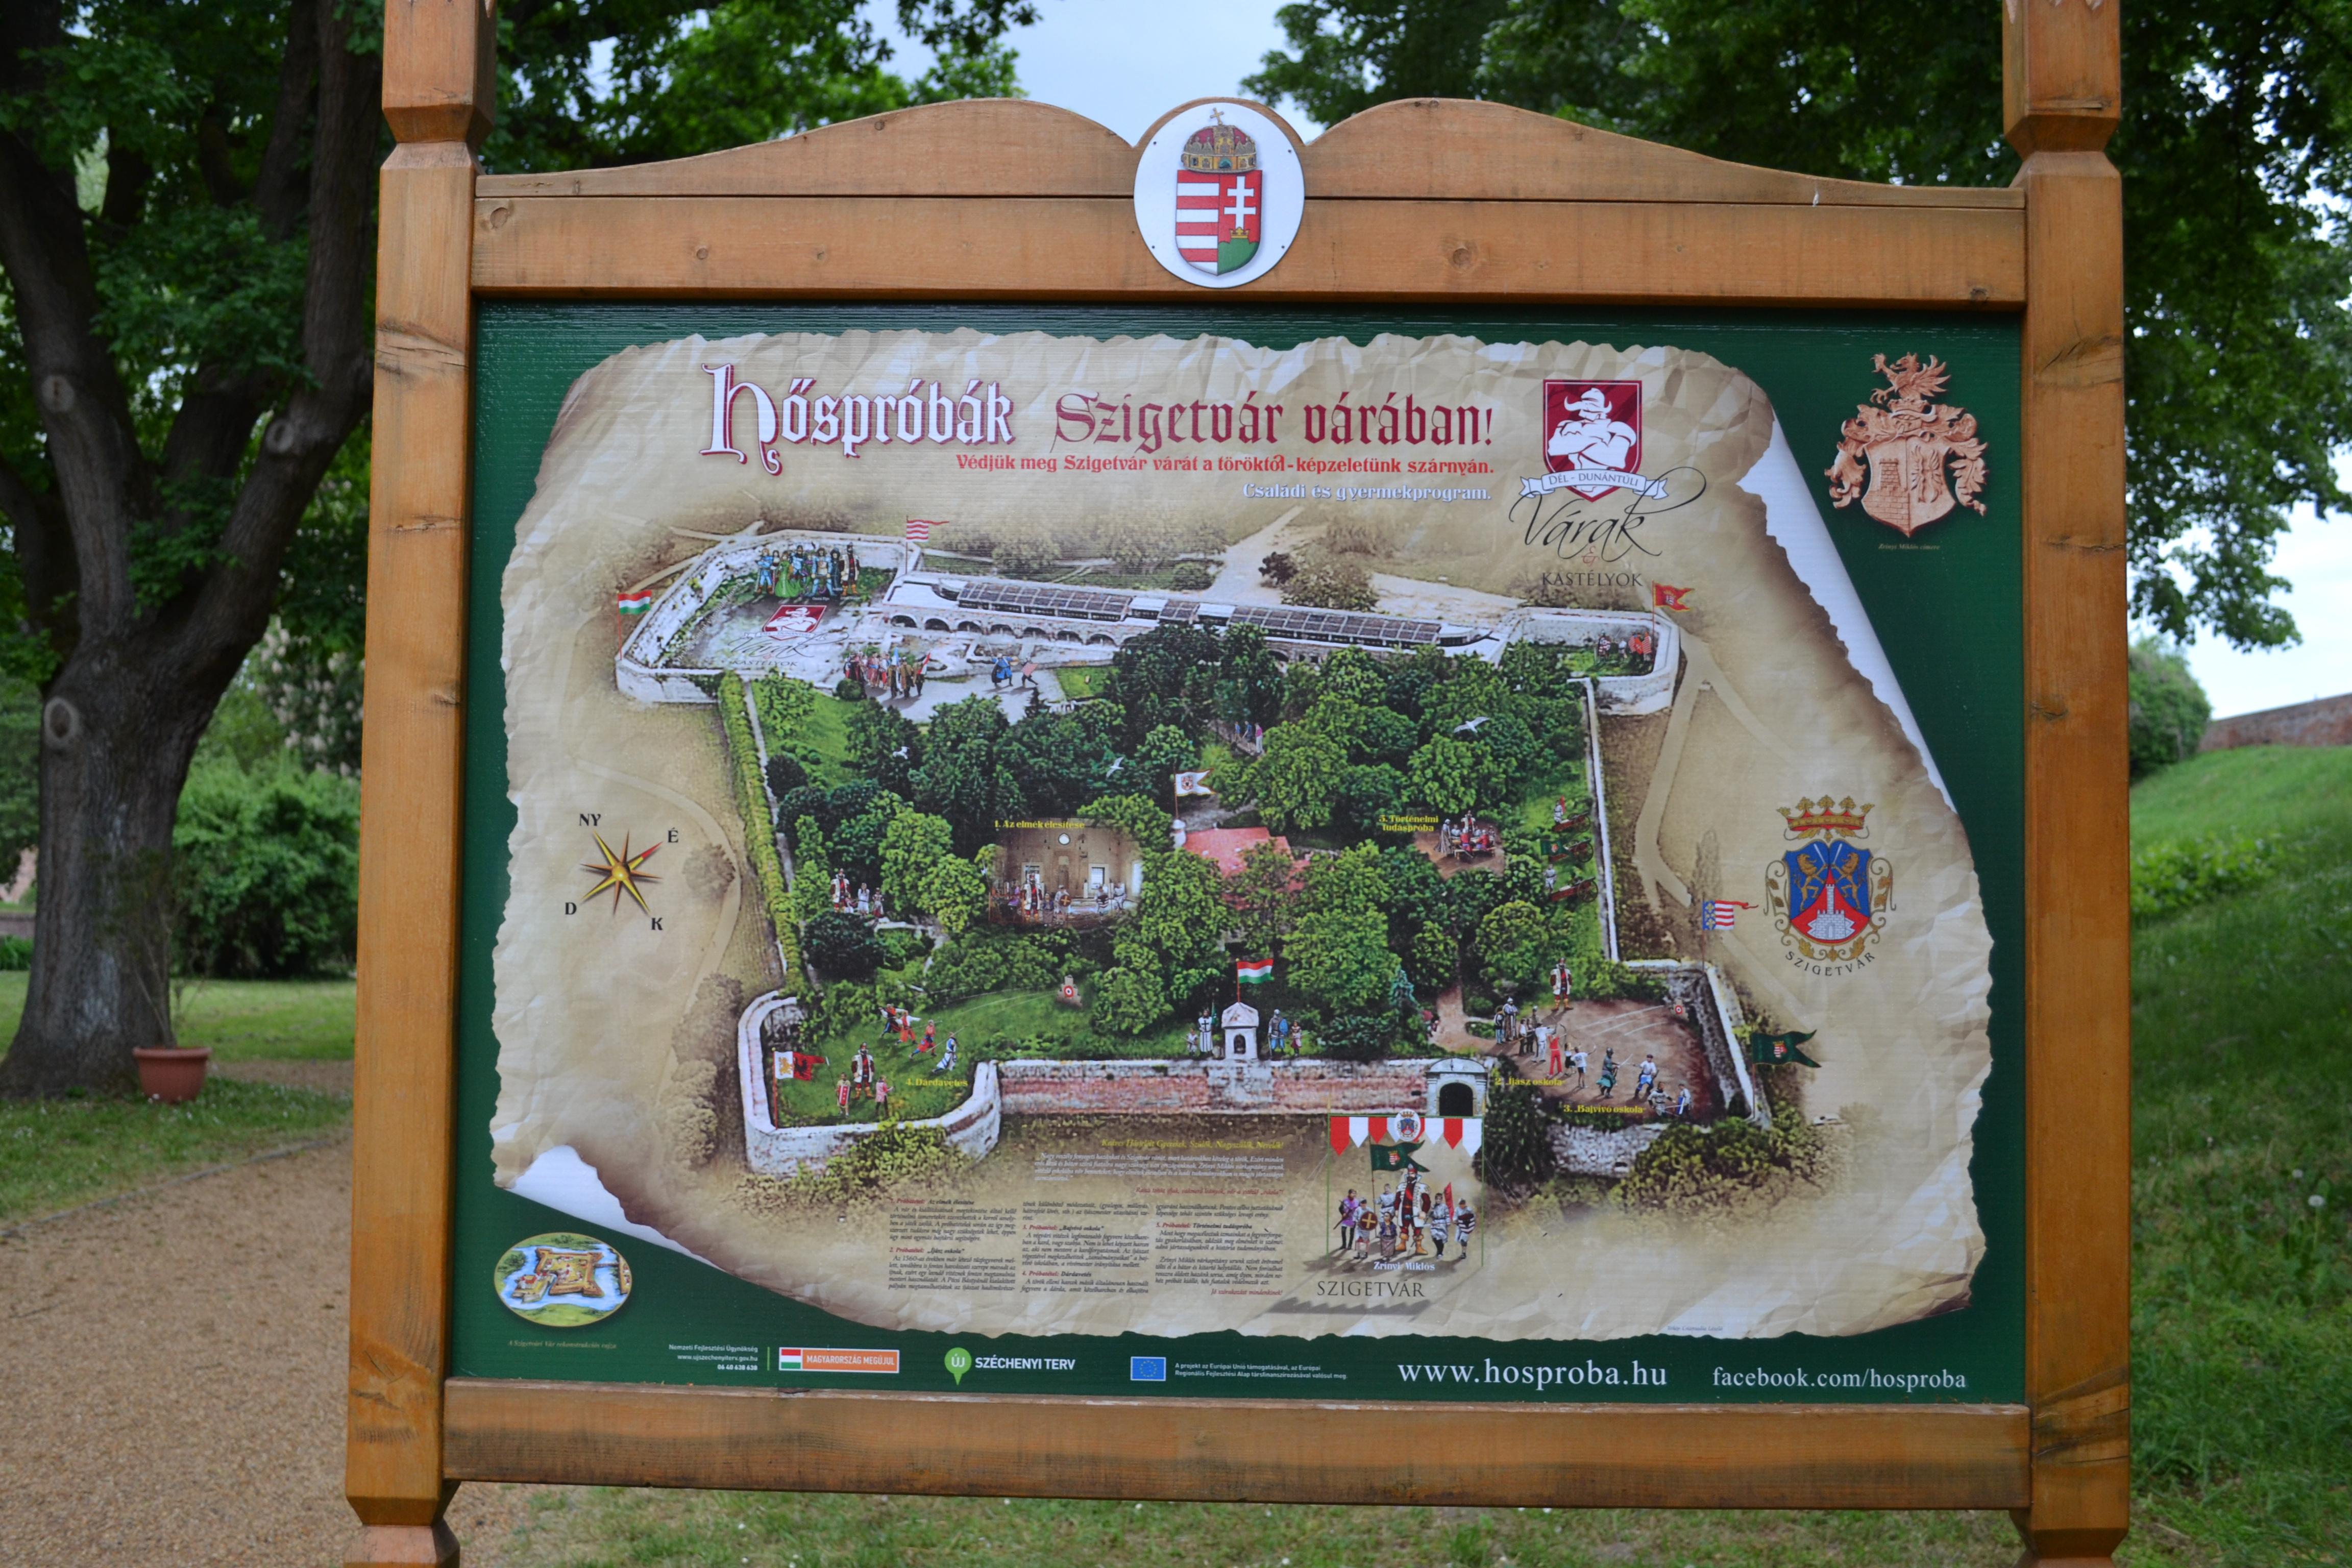 Het oorlogsmuseumpje in Szigetvar